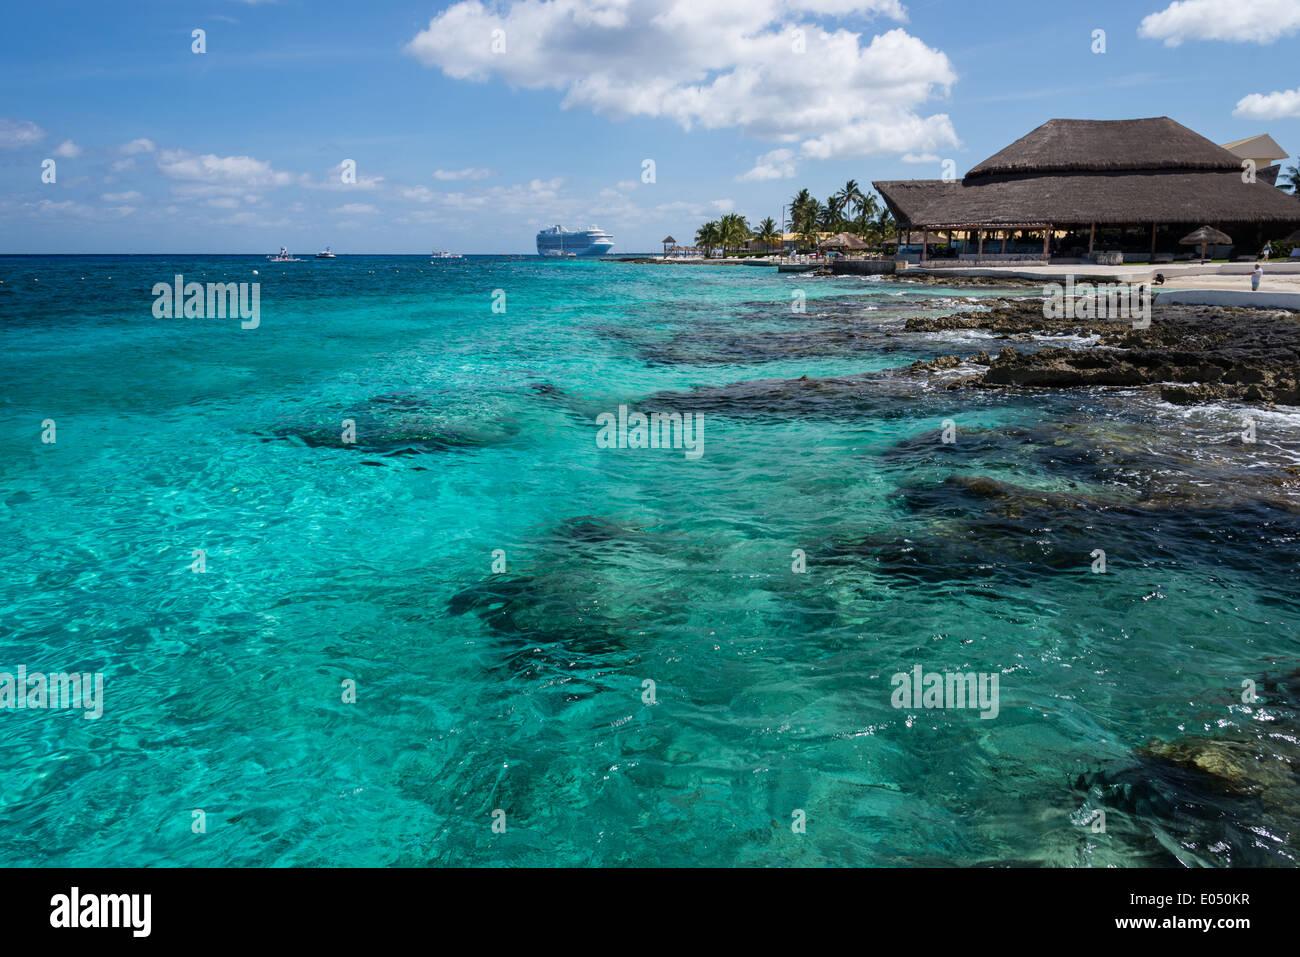 Reef Rocks And Blue Water Around A Luxury Beach Resort